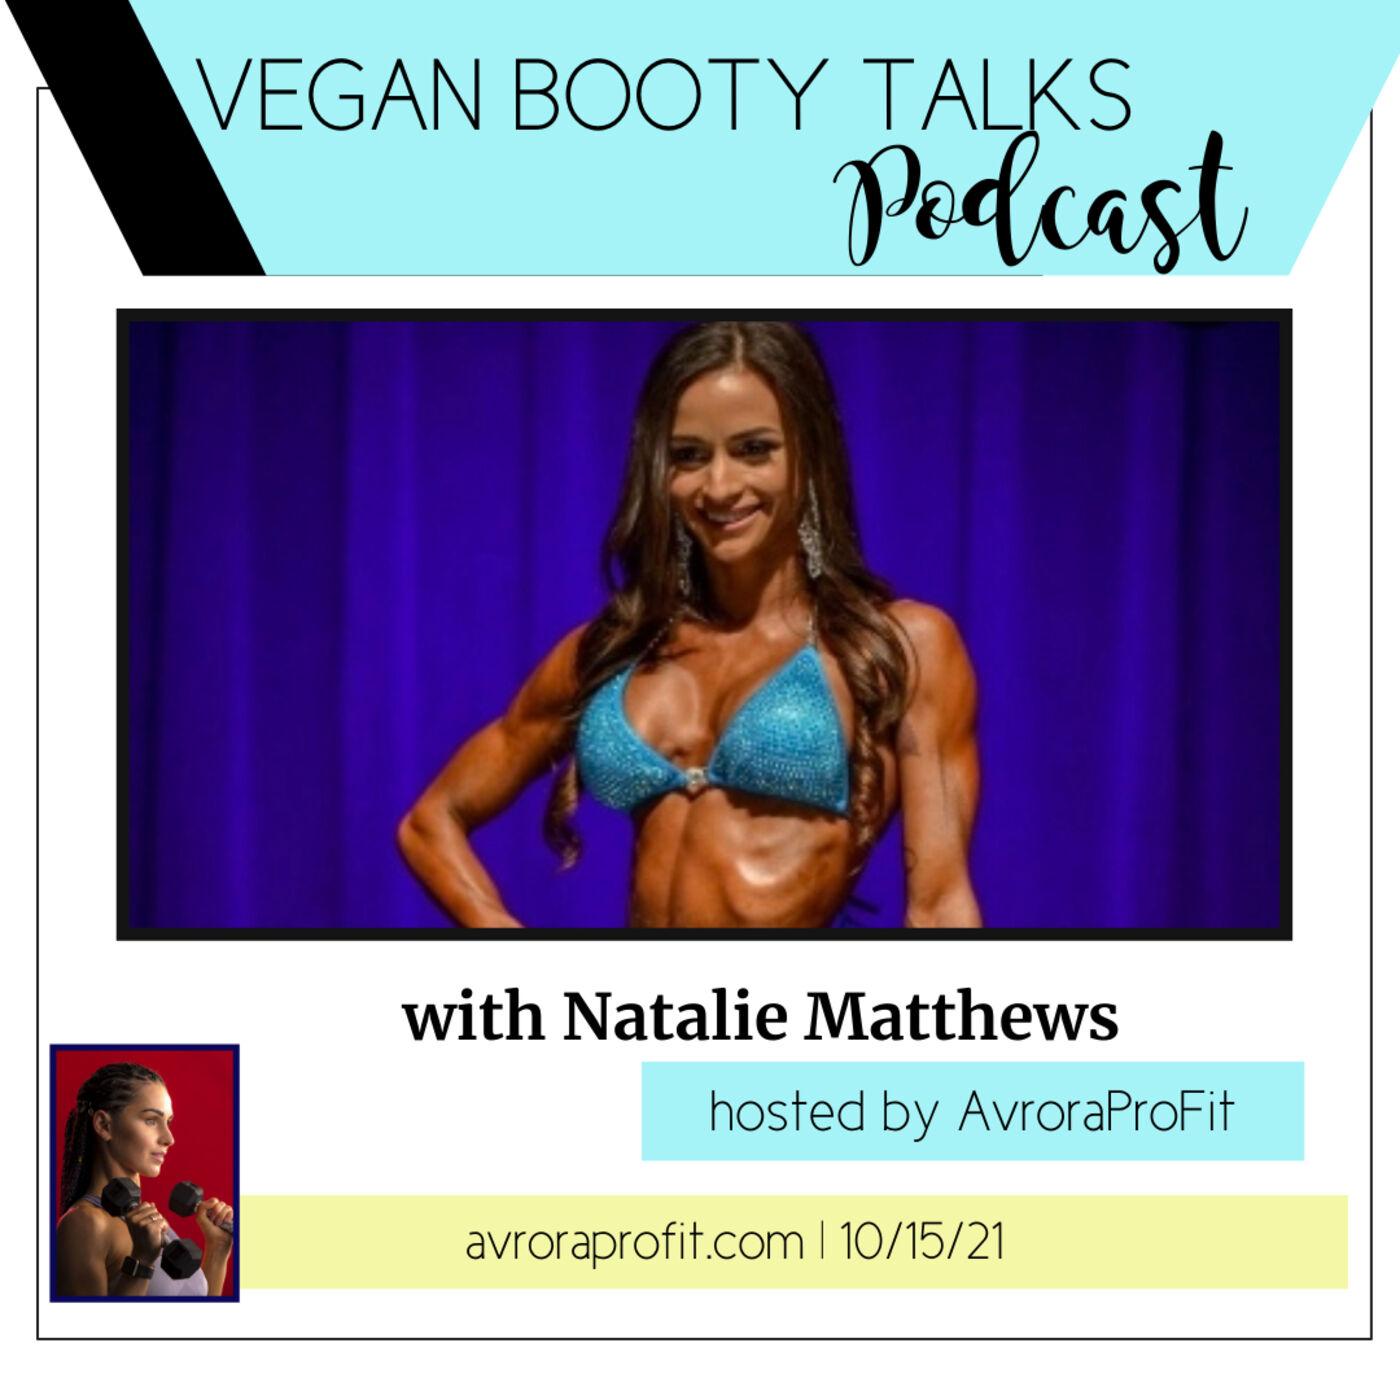 V.B.TALKS with VEGAN IFBBPro Natalie Matthews